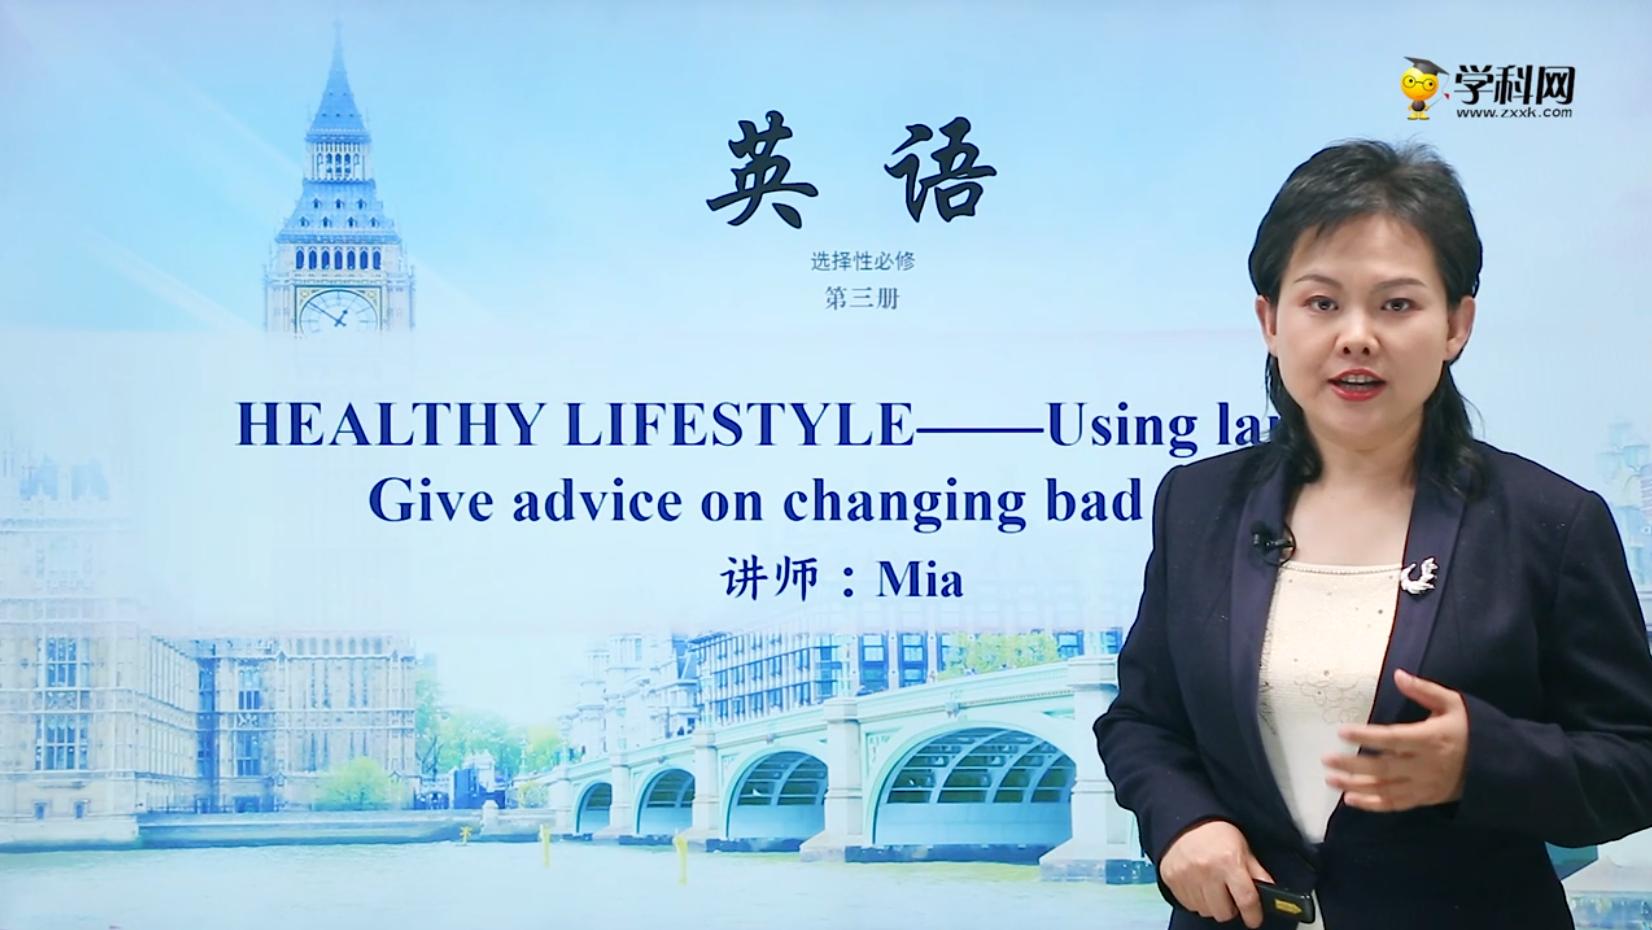 period 4 Using language Give advice on changing bad habits(Unit 2 Healthy lifestyle)-高中英语选择性必修3(新教材同步)